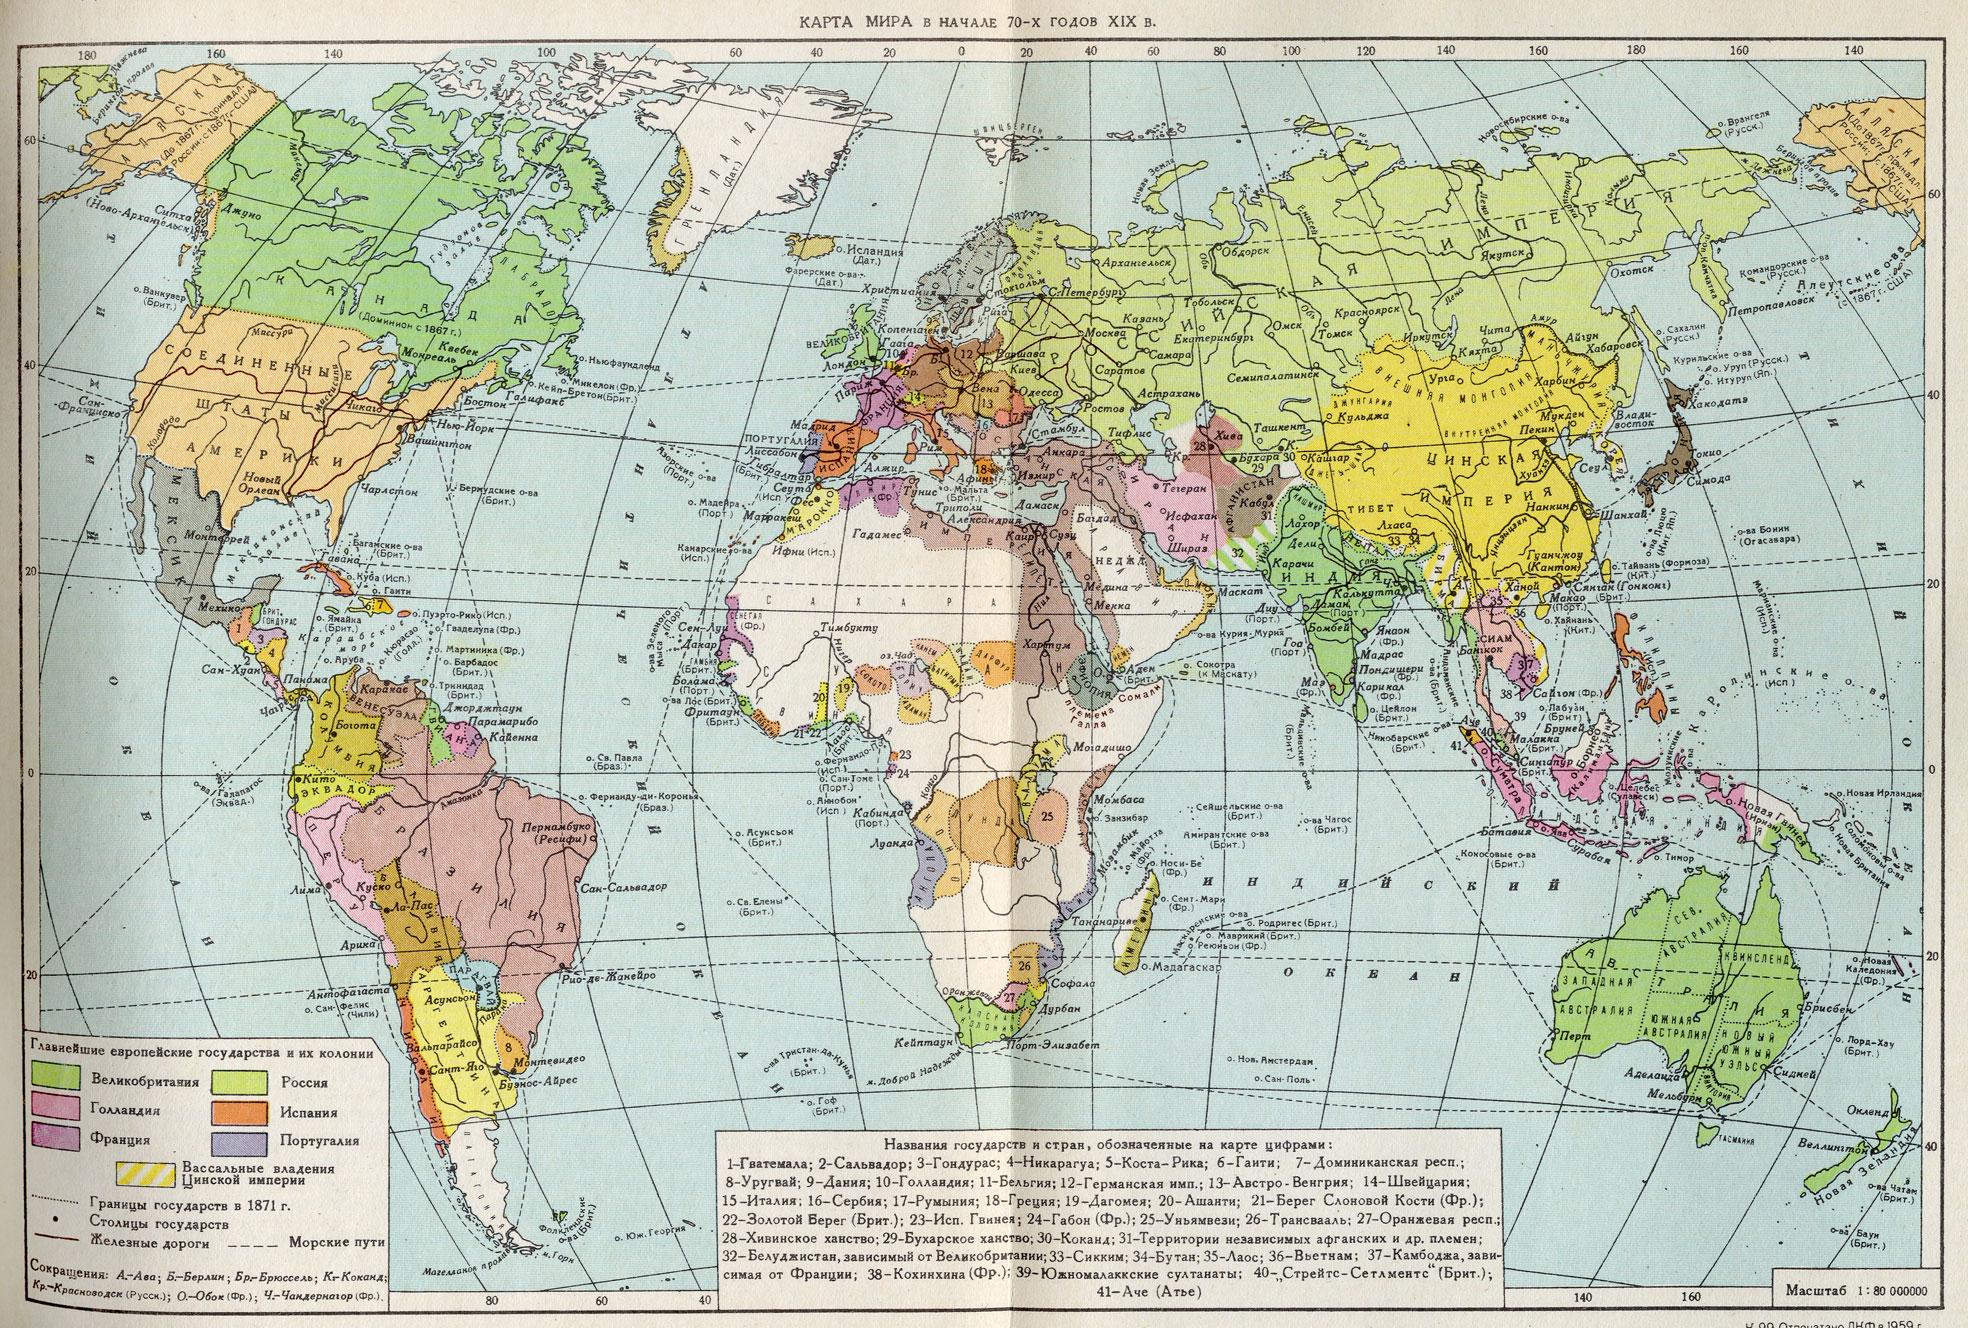 Карта мира в начале 70 х годов xix в